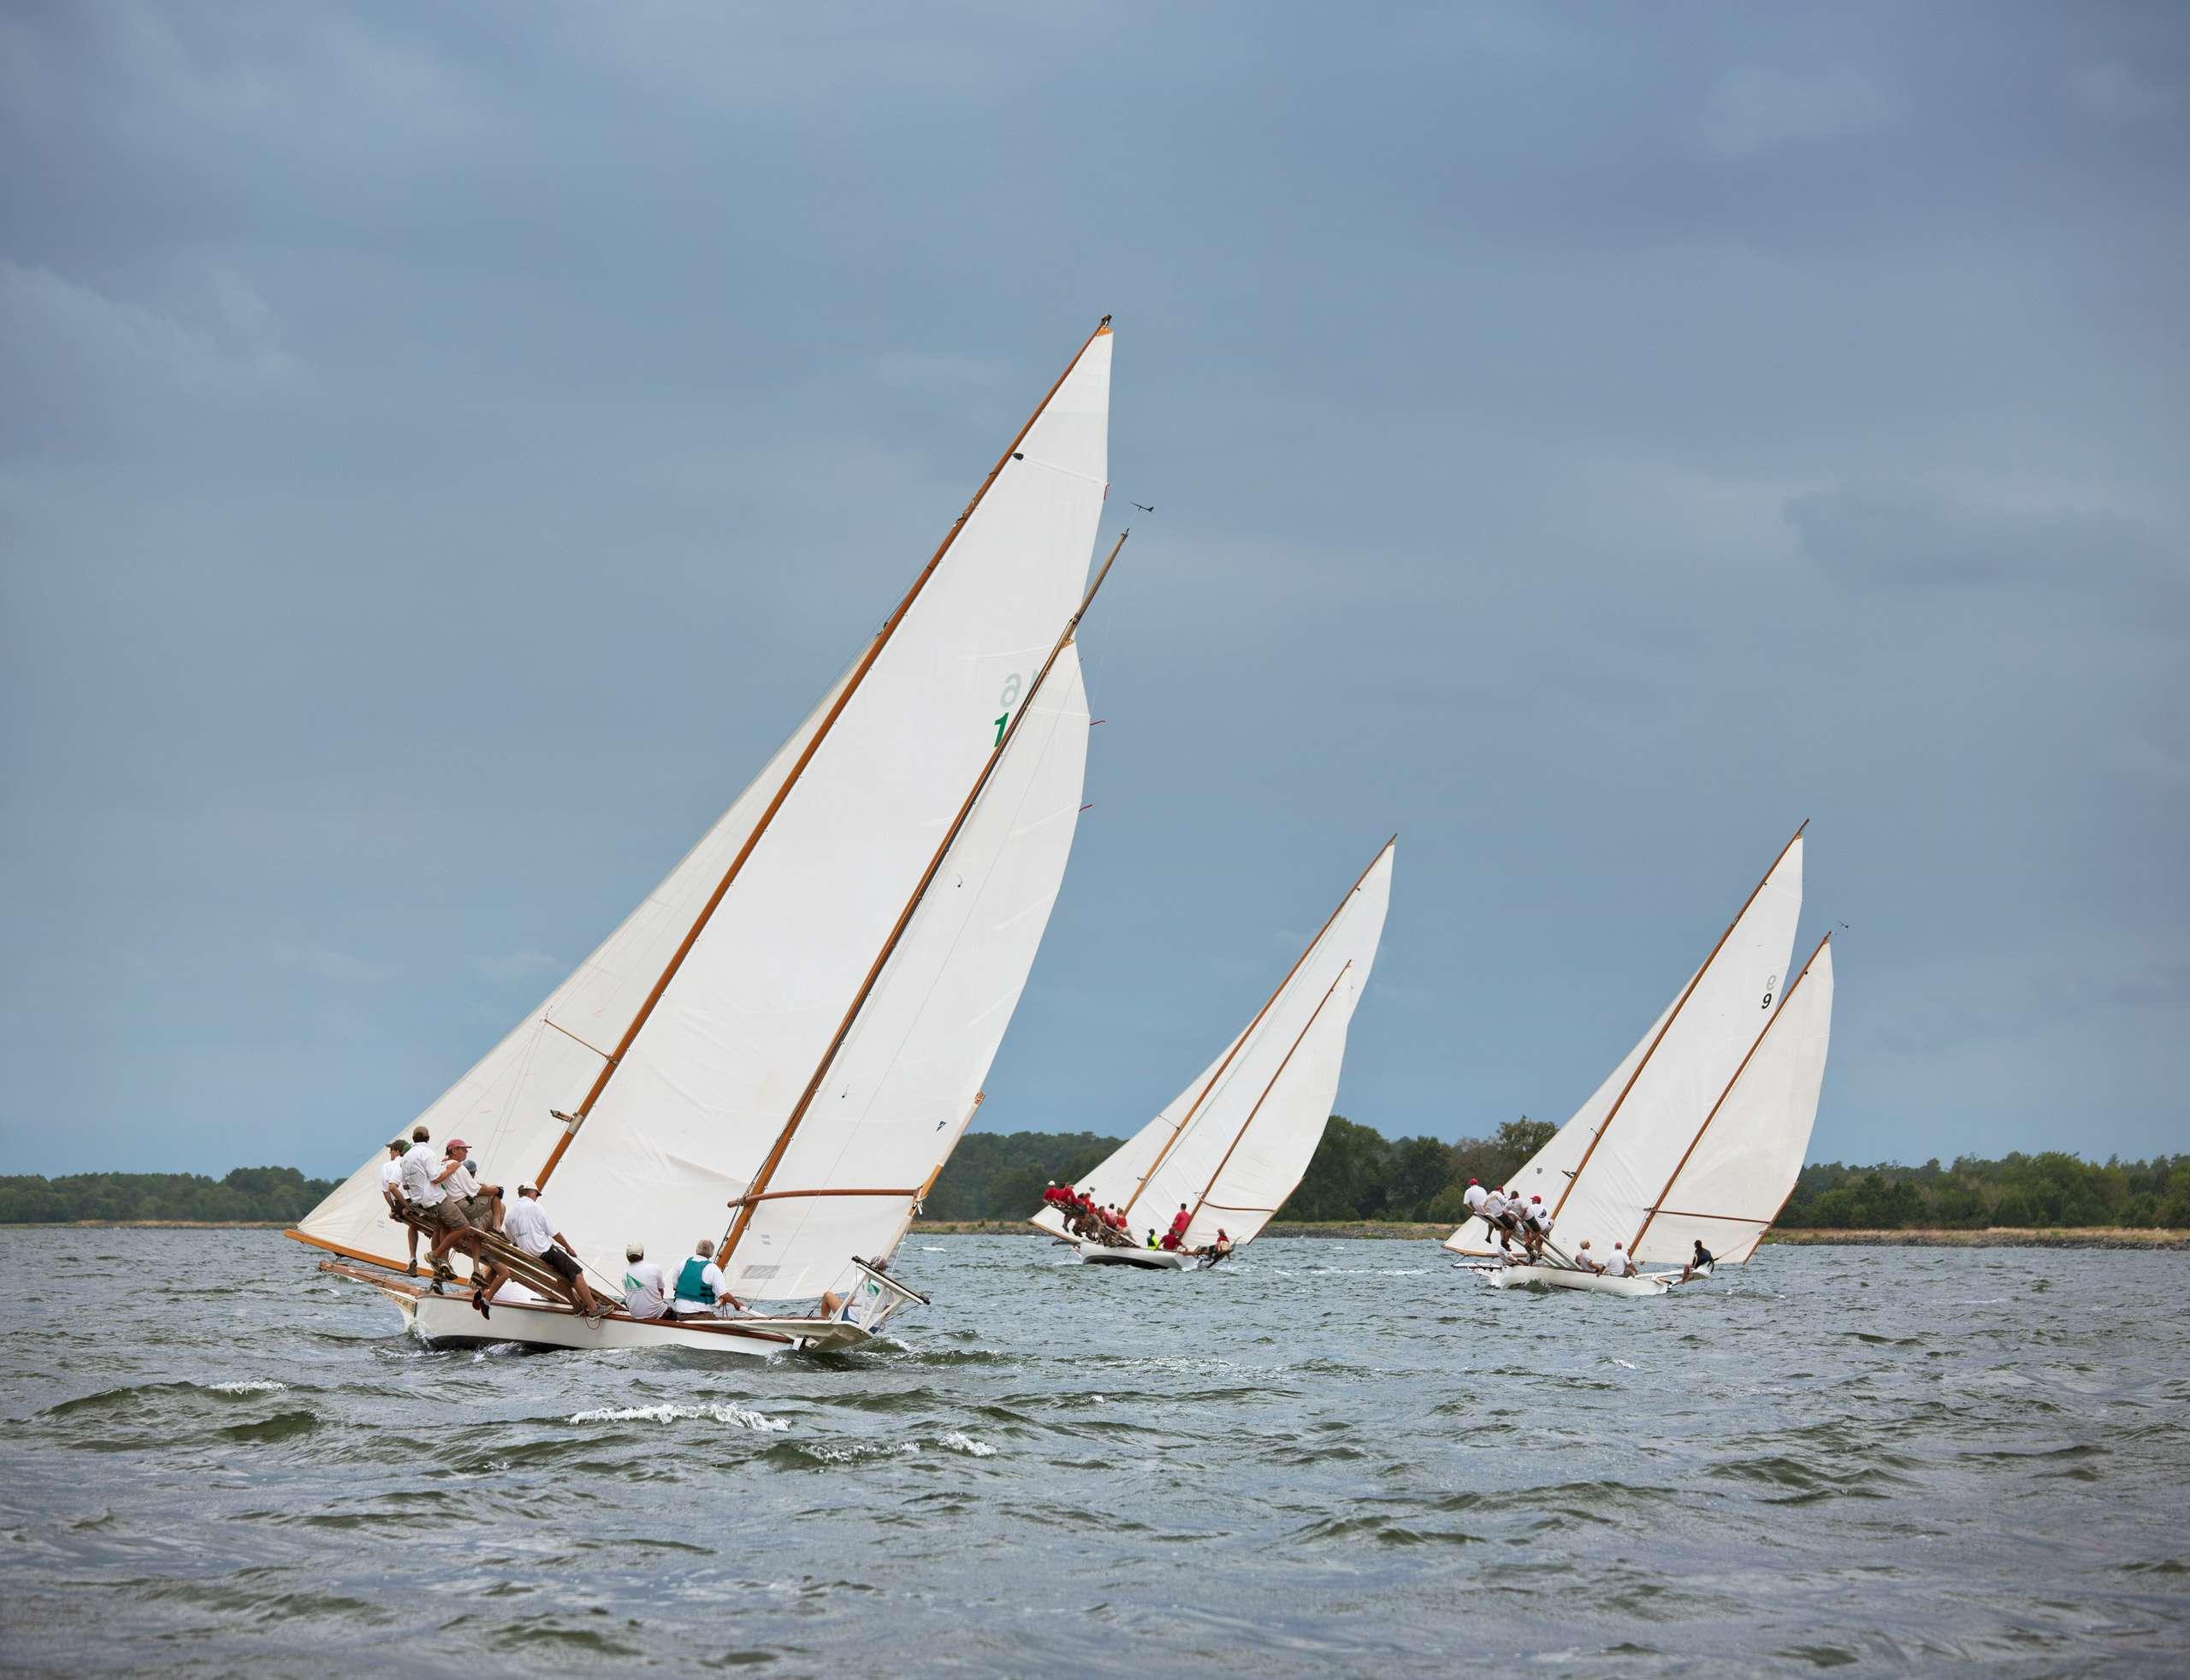 PORTFOLIO - Sailing - Log Canoes #12   PCG554